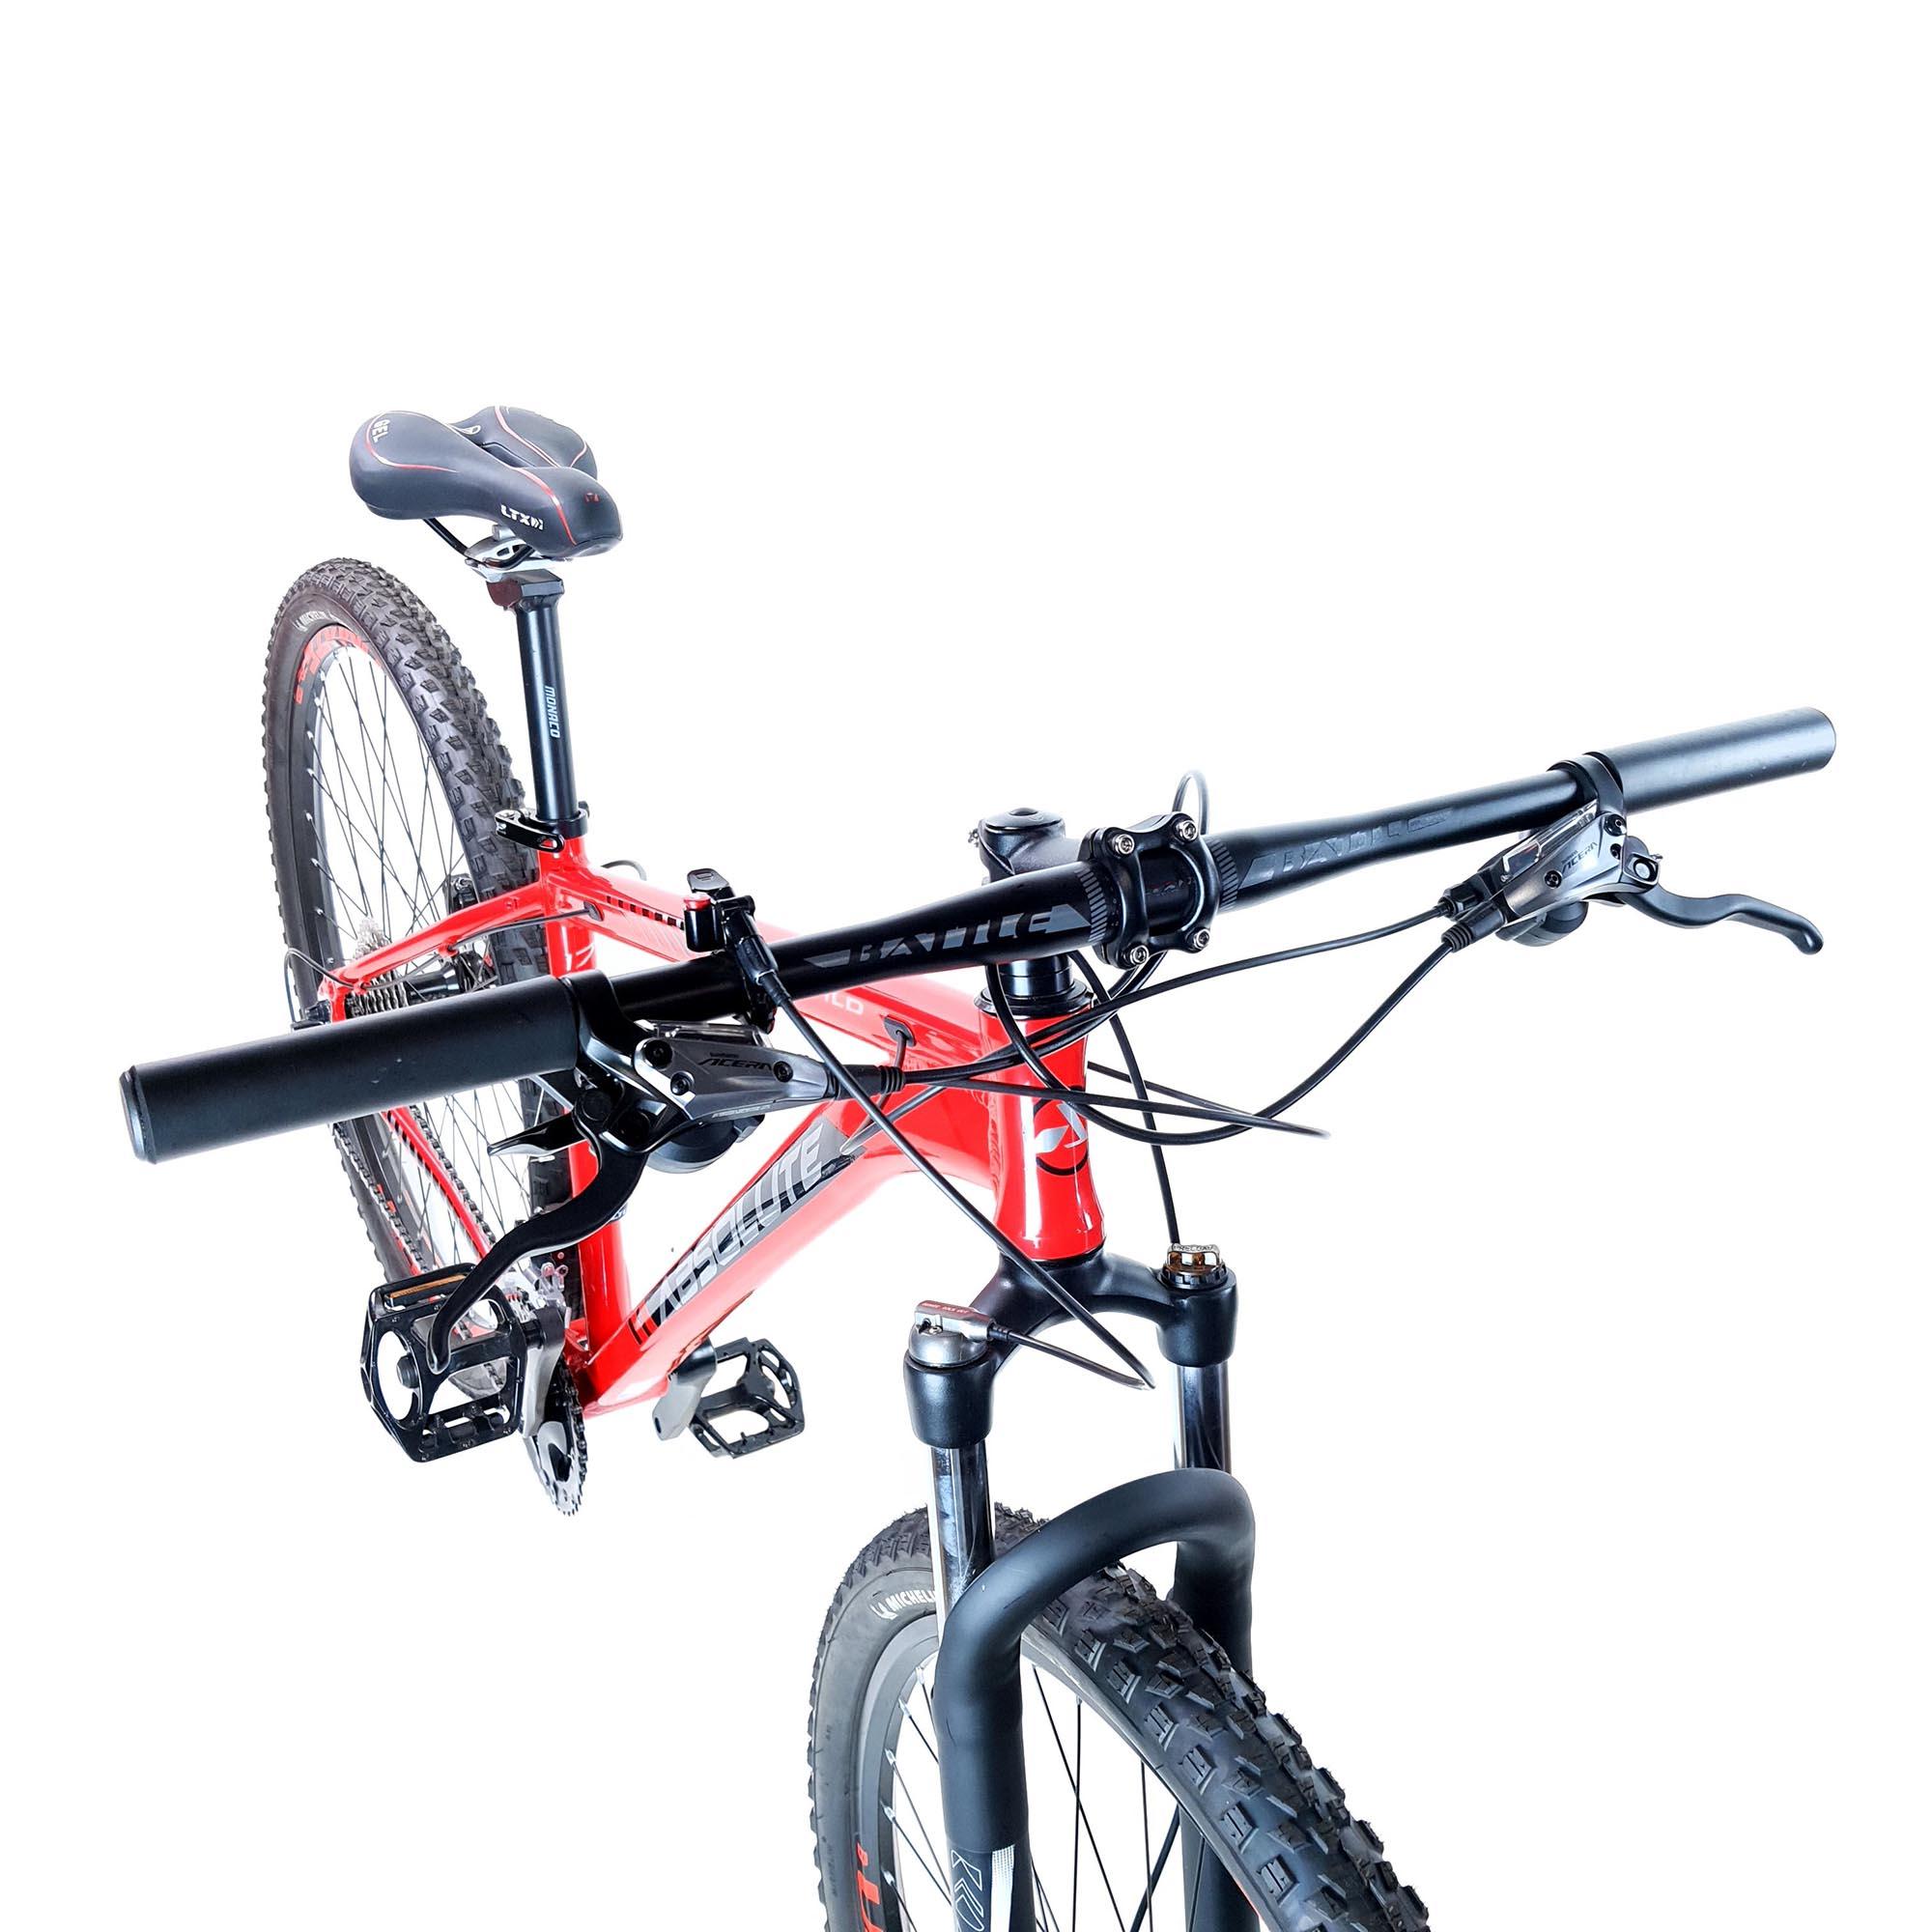 Bicicleta Aro 29 Absolute Wild, Suspensão Hidráulica Ltx, Freio Shimano